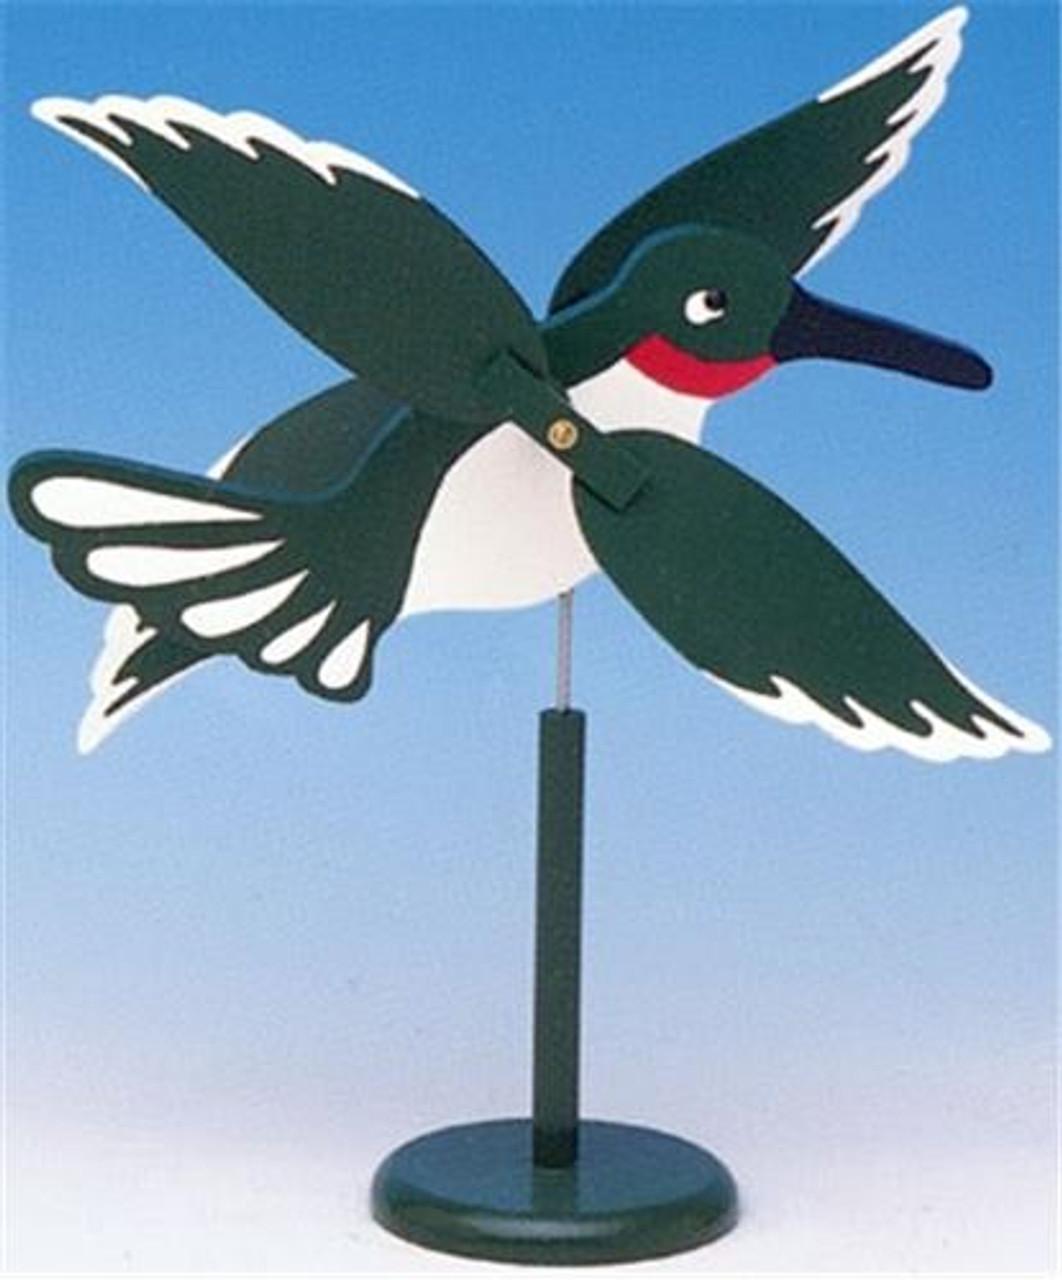 Cherry Tree Toys Hummingbird Whirligig DIY Kit